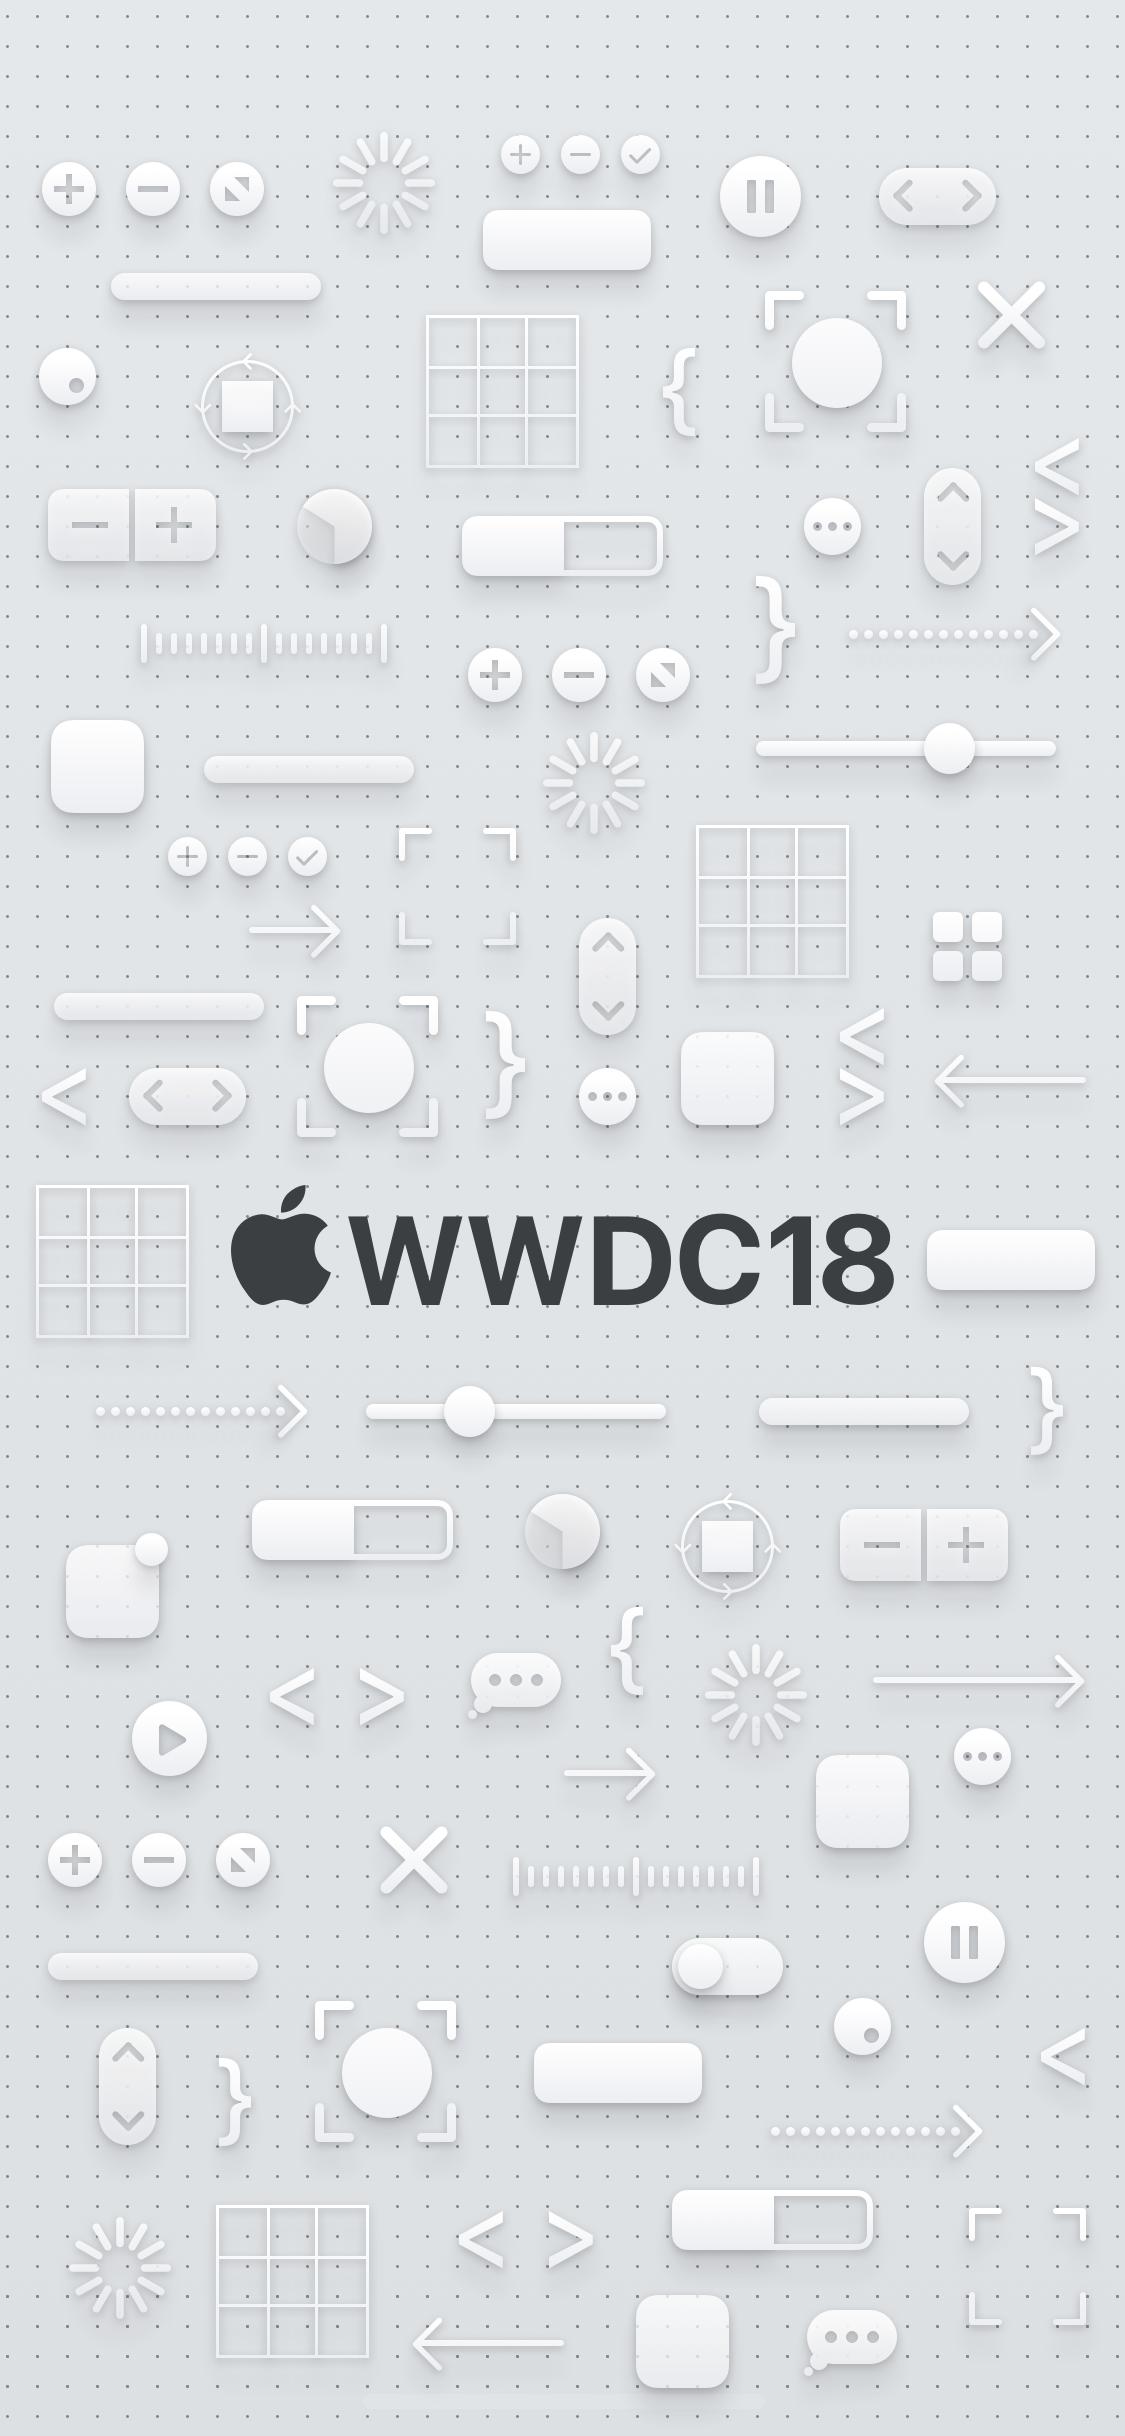 WWDC 2018 wallpaper iPhone X dark logo